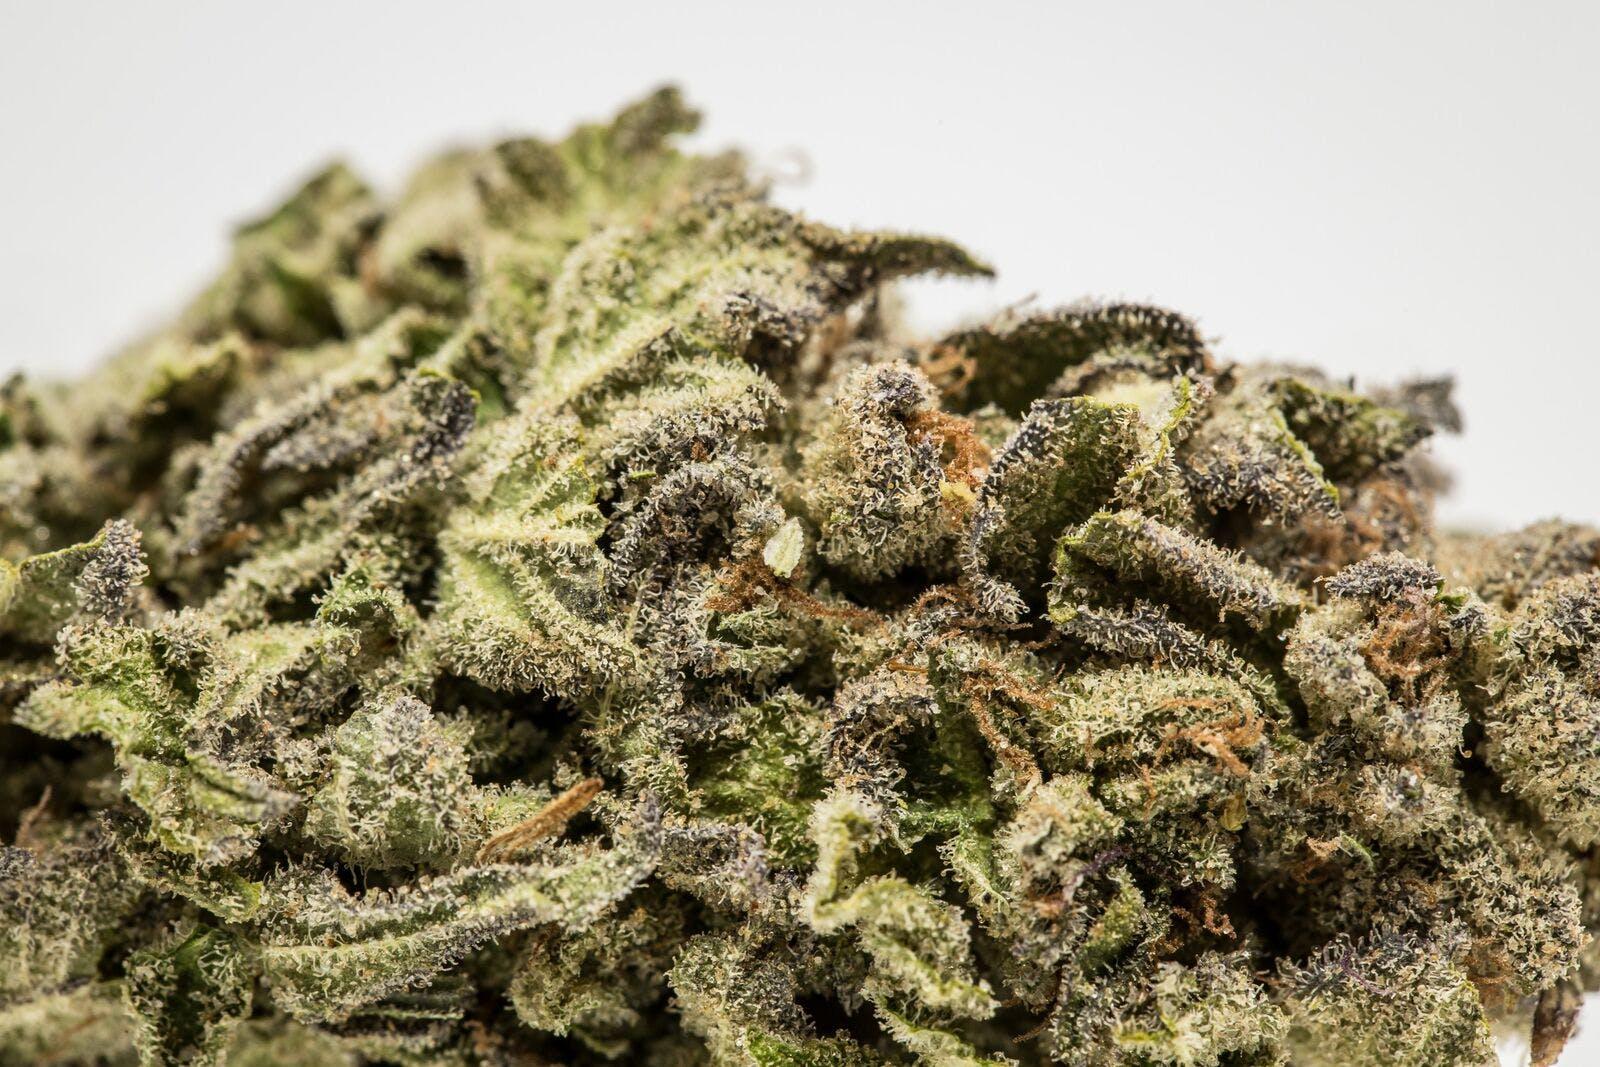 Candy Skunk Weed; Candy Skunk Cannabis Strain; Candy Skunk Sativa Marijuana Strain